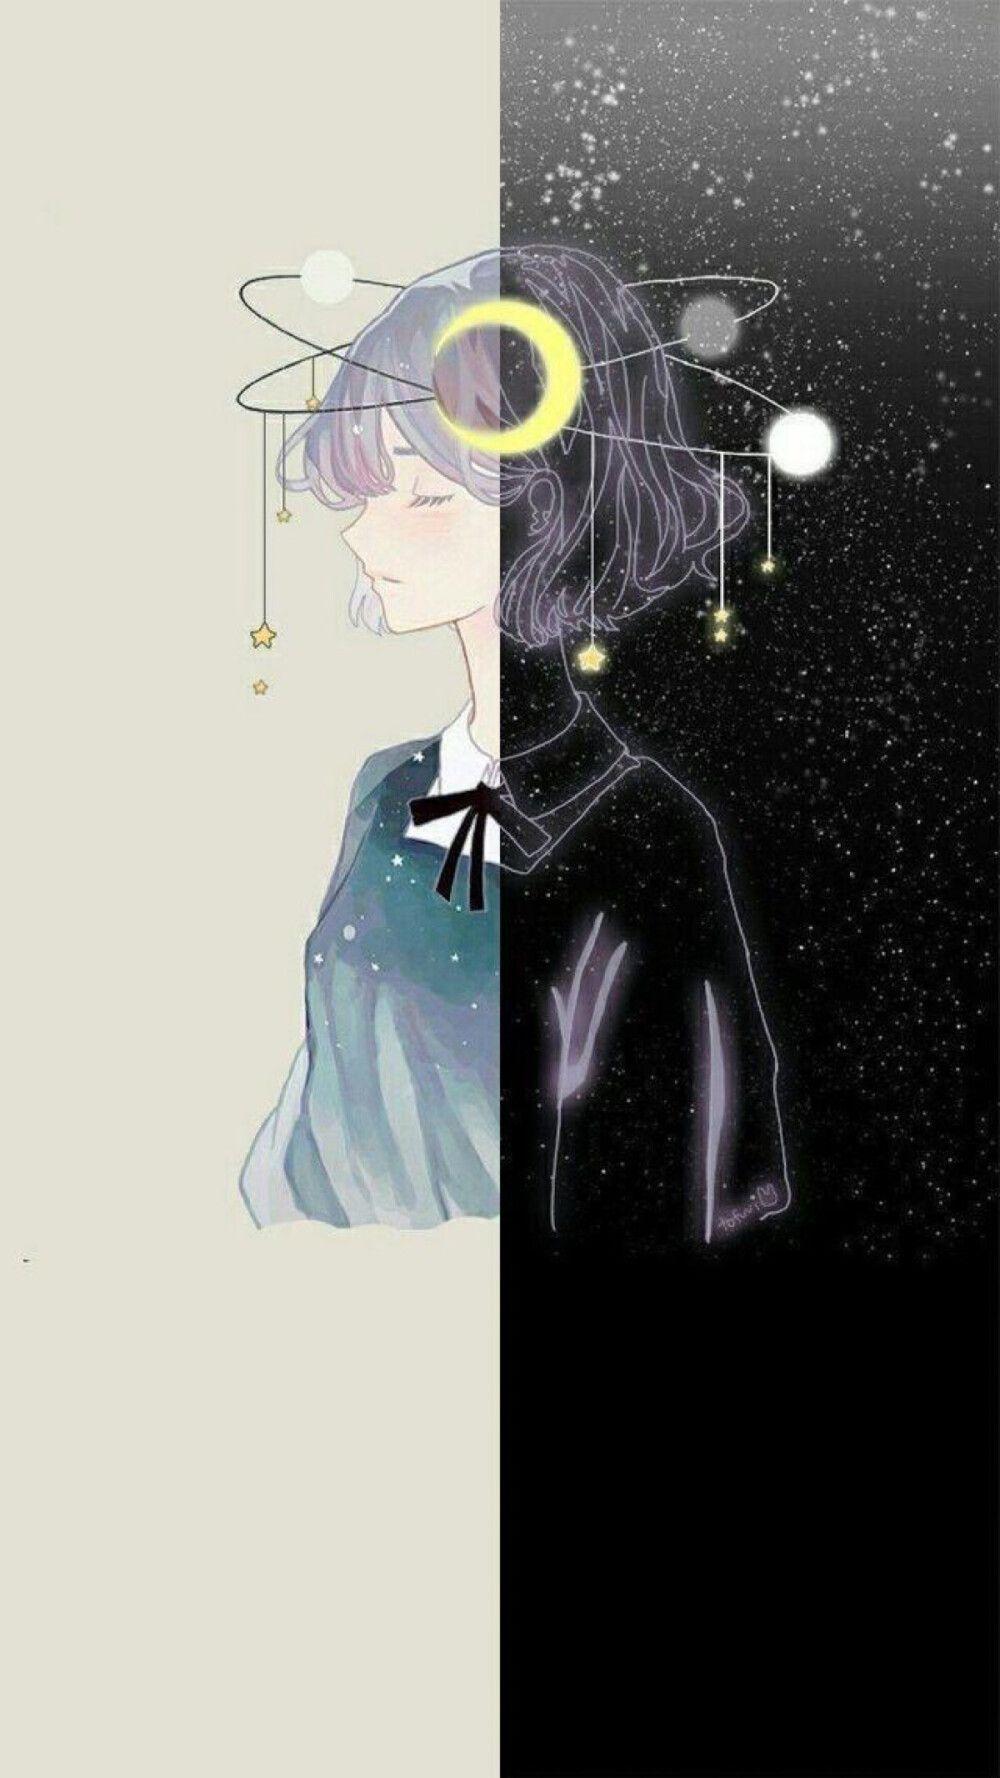 Pin By Xich Diễm Cố Tich On Art Nữ Cute Anime Wallpaper Anime Wallpaper Anime Art Beautiful Cute anime tumblr hd wallpaper